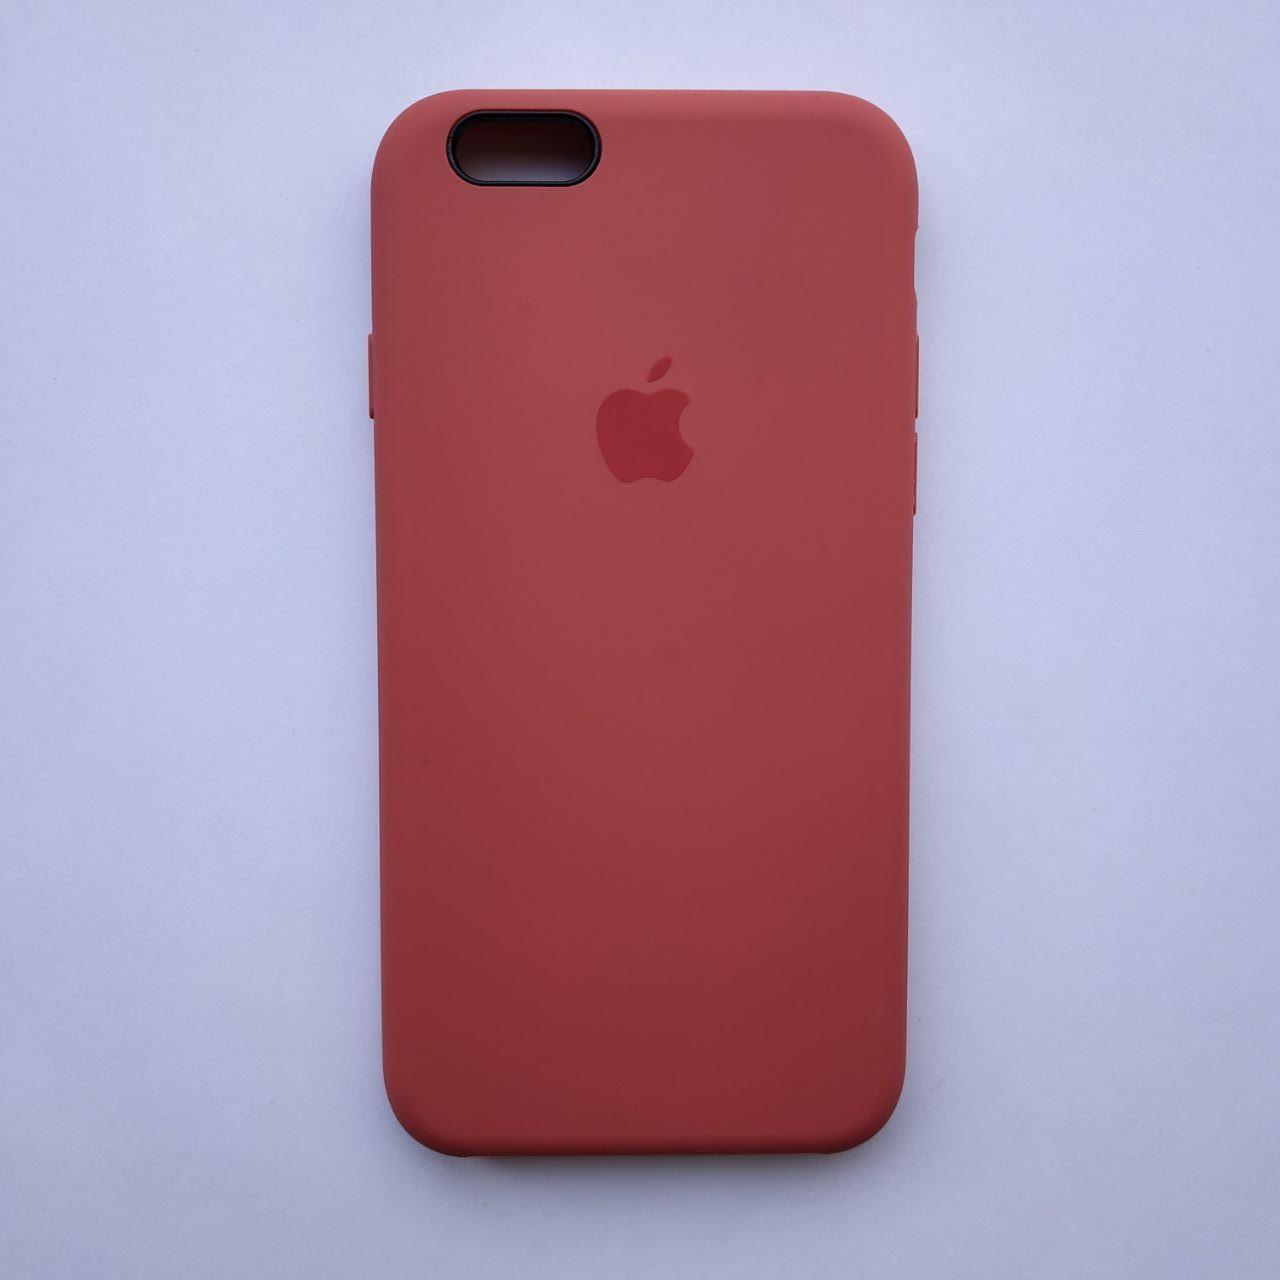 Накладка оригинальная Apple Silicone Case для iPhone 6, 6S Cherry